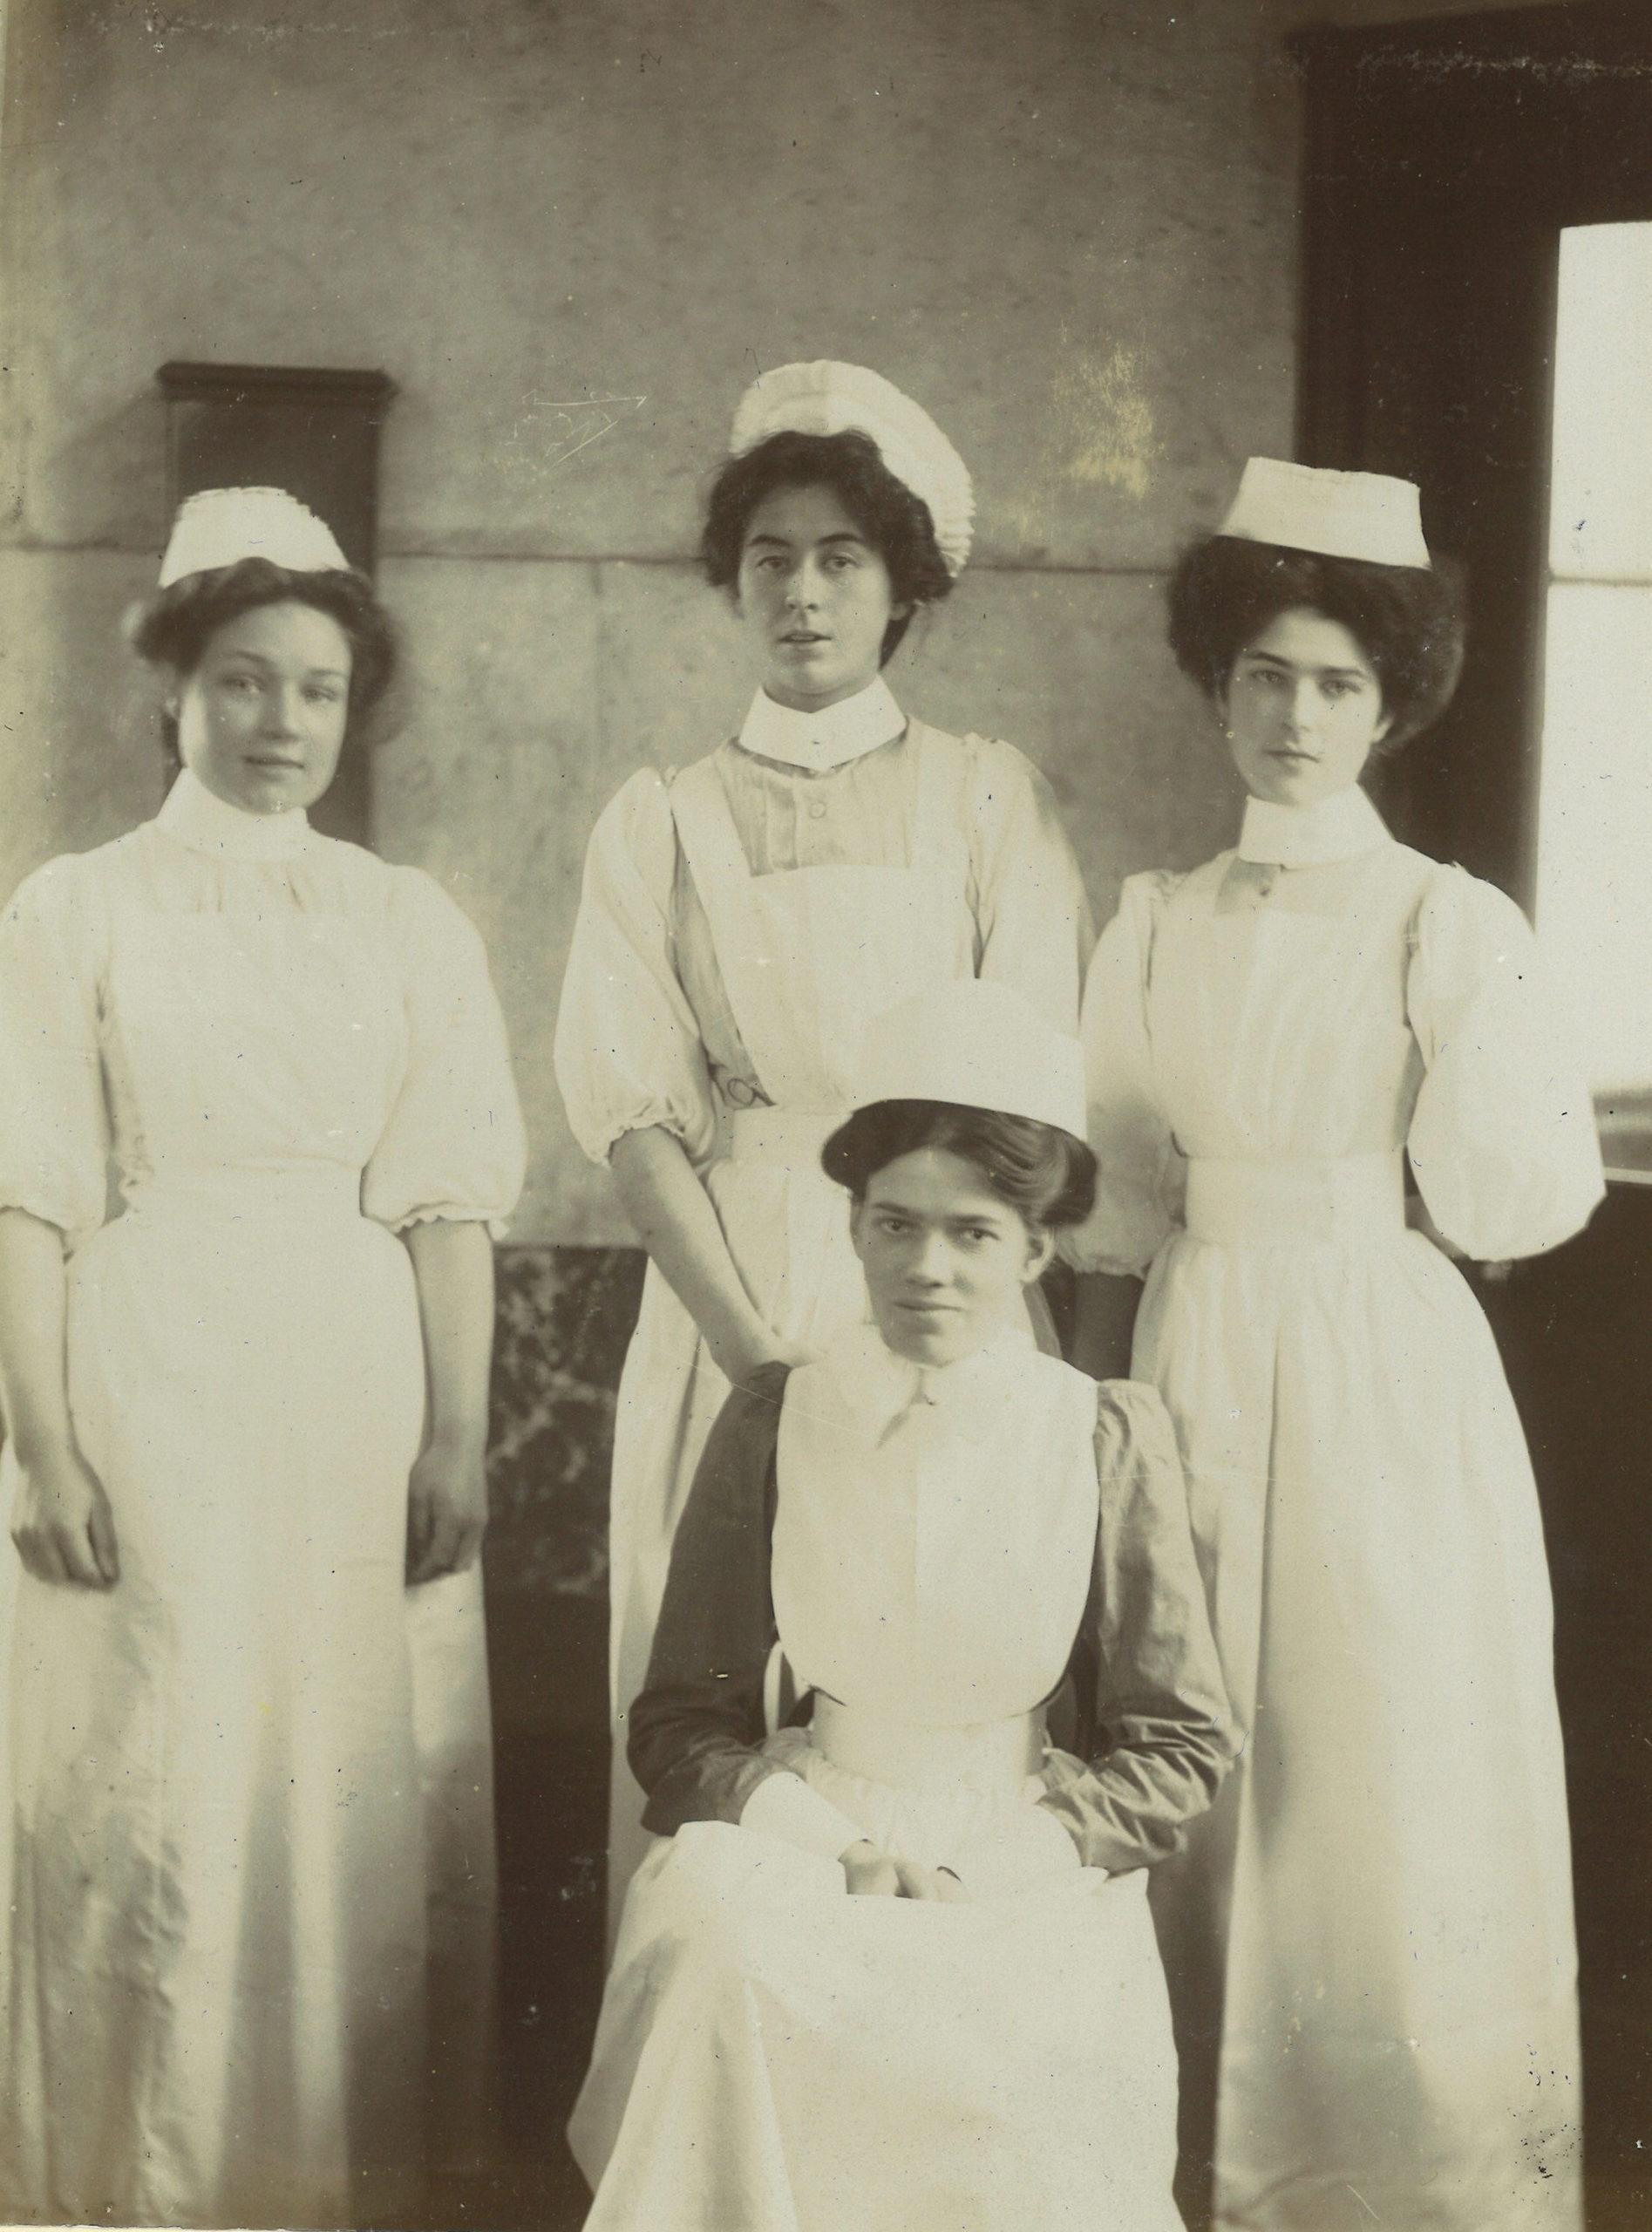 Nurses in uniform, 1890s